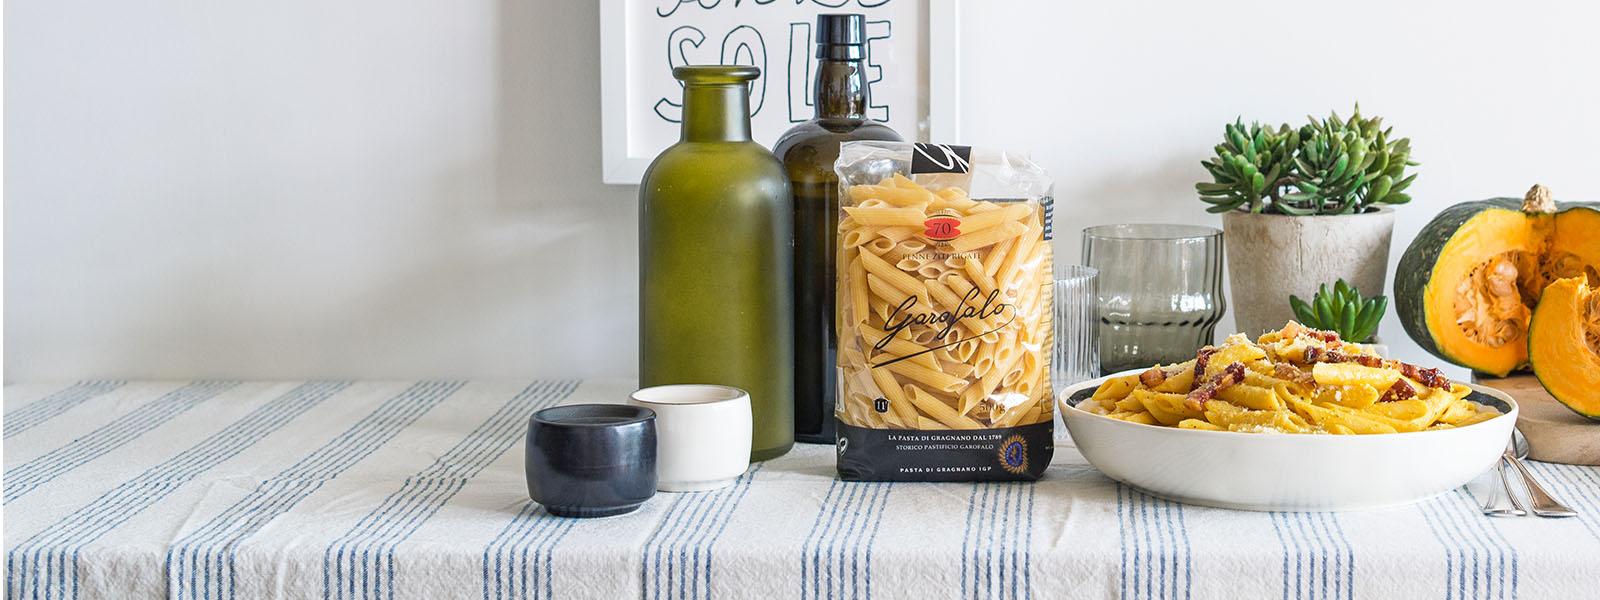 Pasta Garofalo: uniek dankzij passie